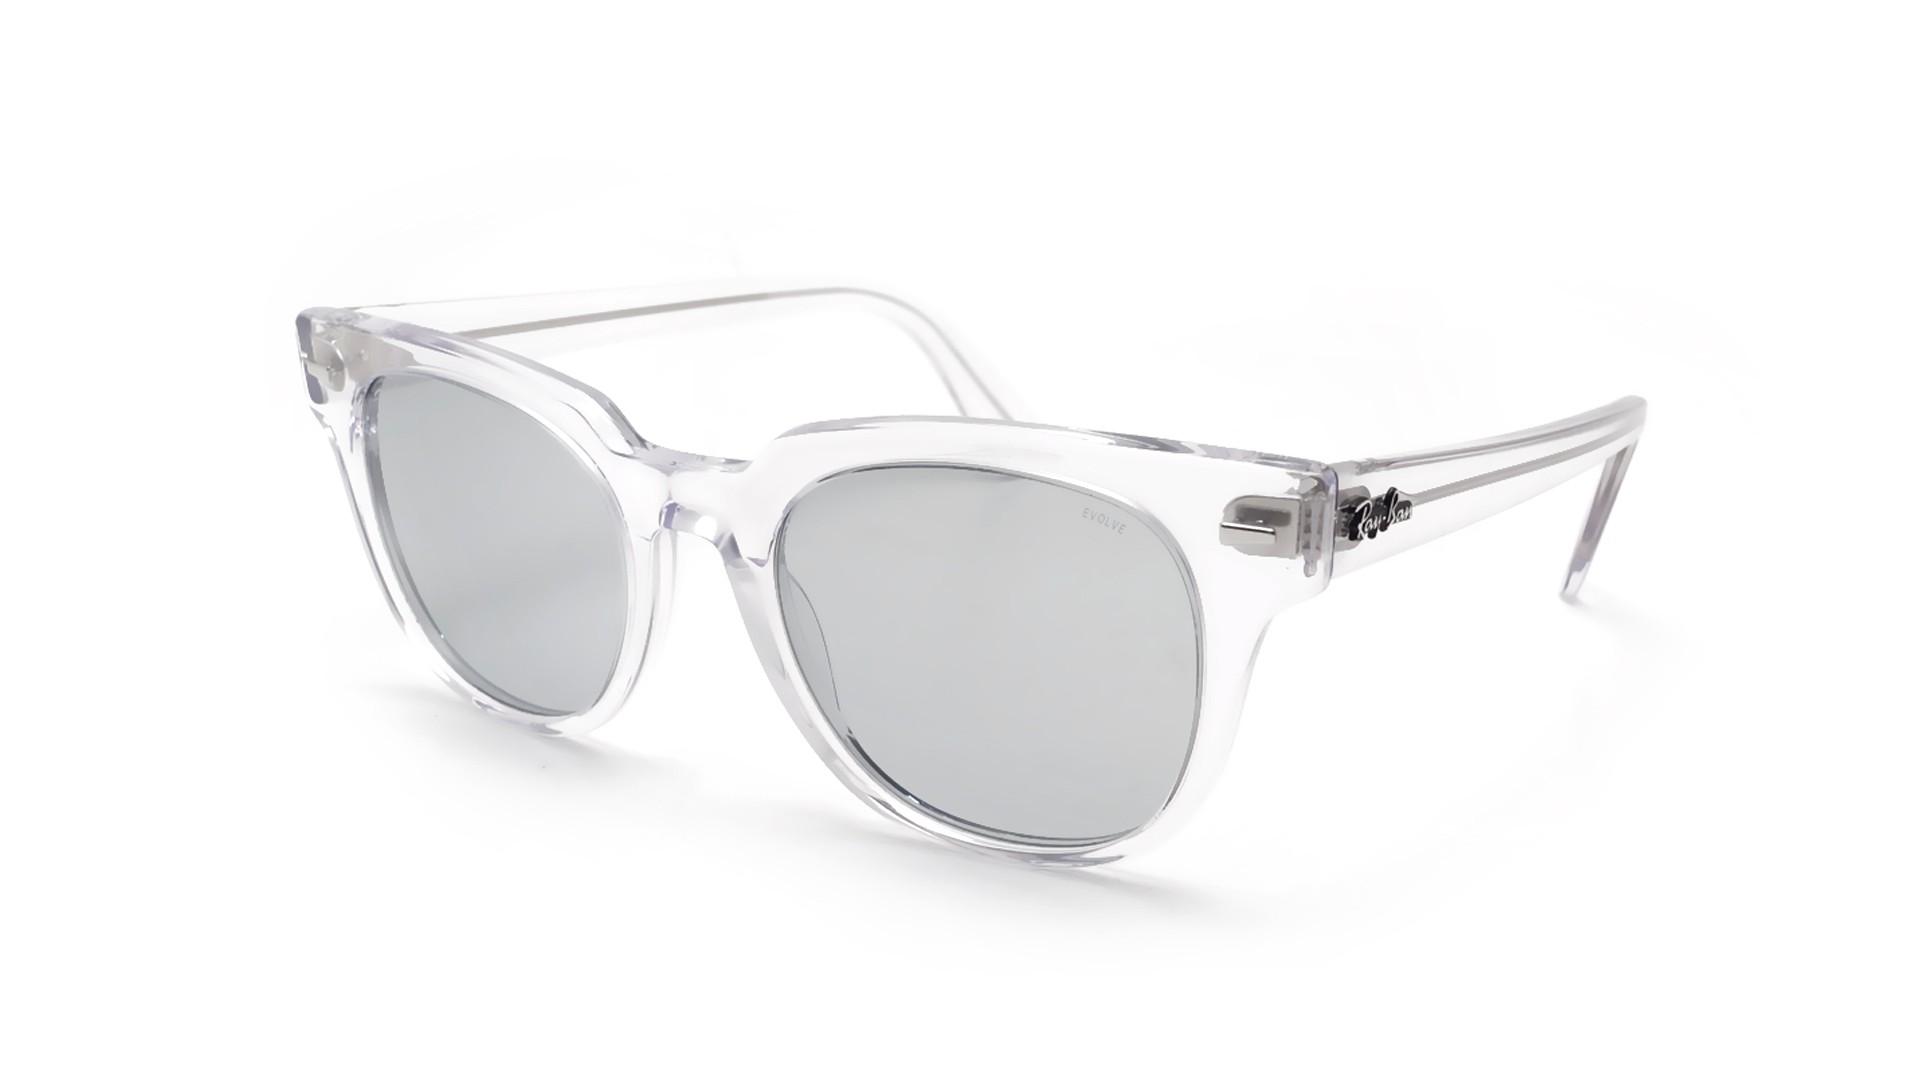 4a4928872f41 Sunglasses Ray-Ban Meteor Evolve RB2168 912 I5 50-20 Medium Photochromic